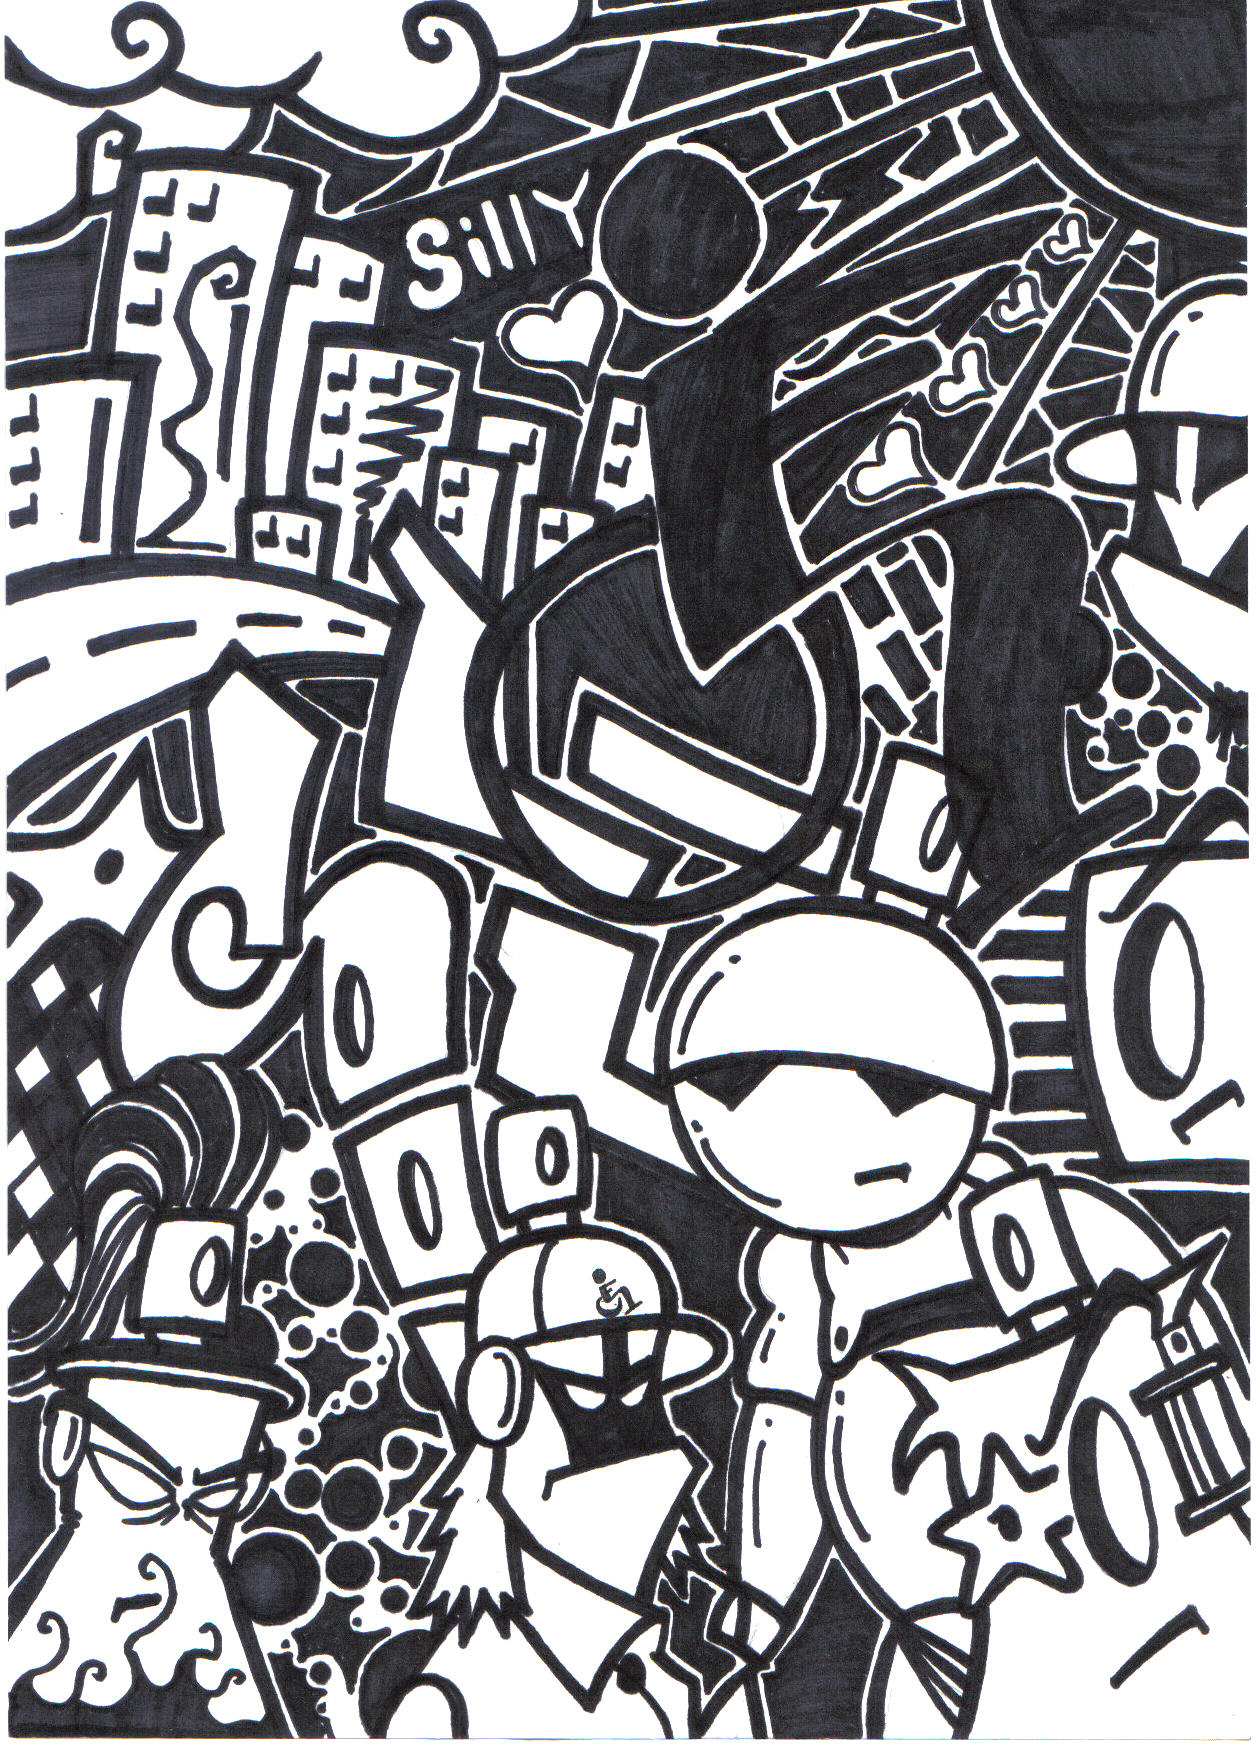 black n white mural on paper by silifulz on deviantart. Black Bedroom Furniture Sets. Home Design Ideas